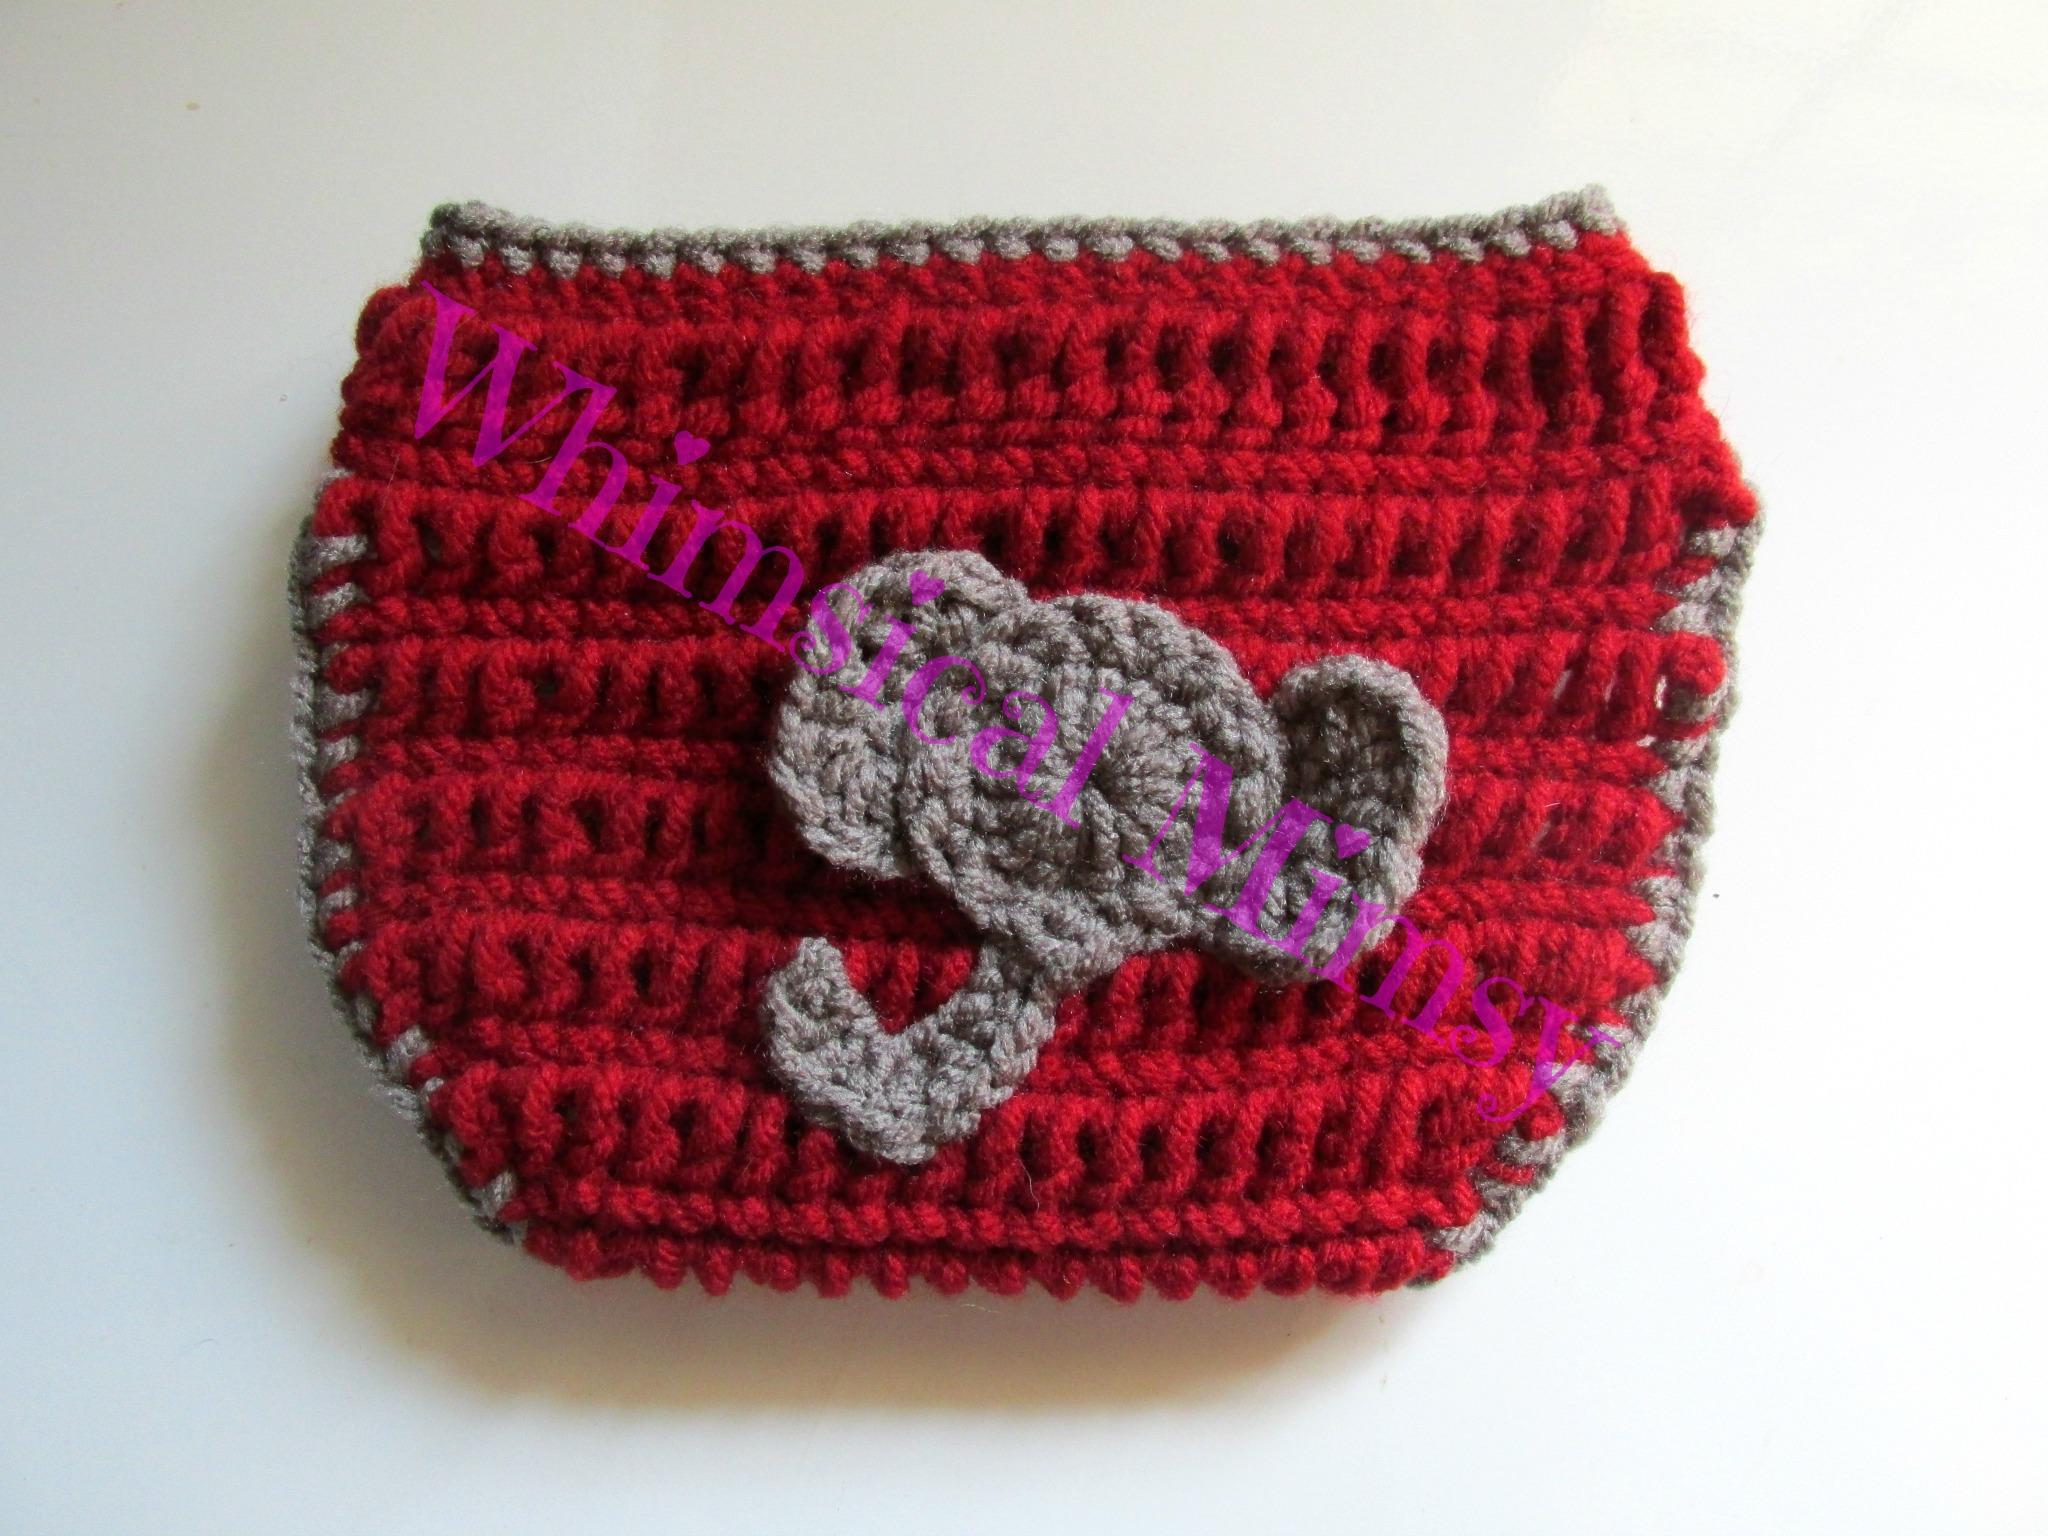 d04d0bb076f Crochet Alabama Football Inspired Newborn Hat and Diaper Cover Set ...